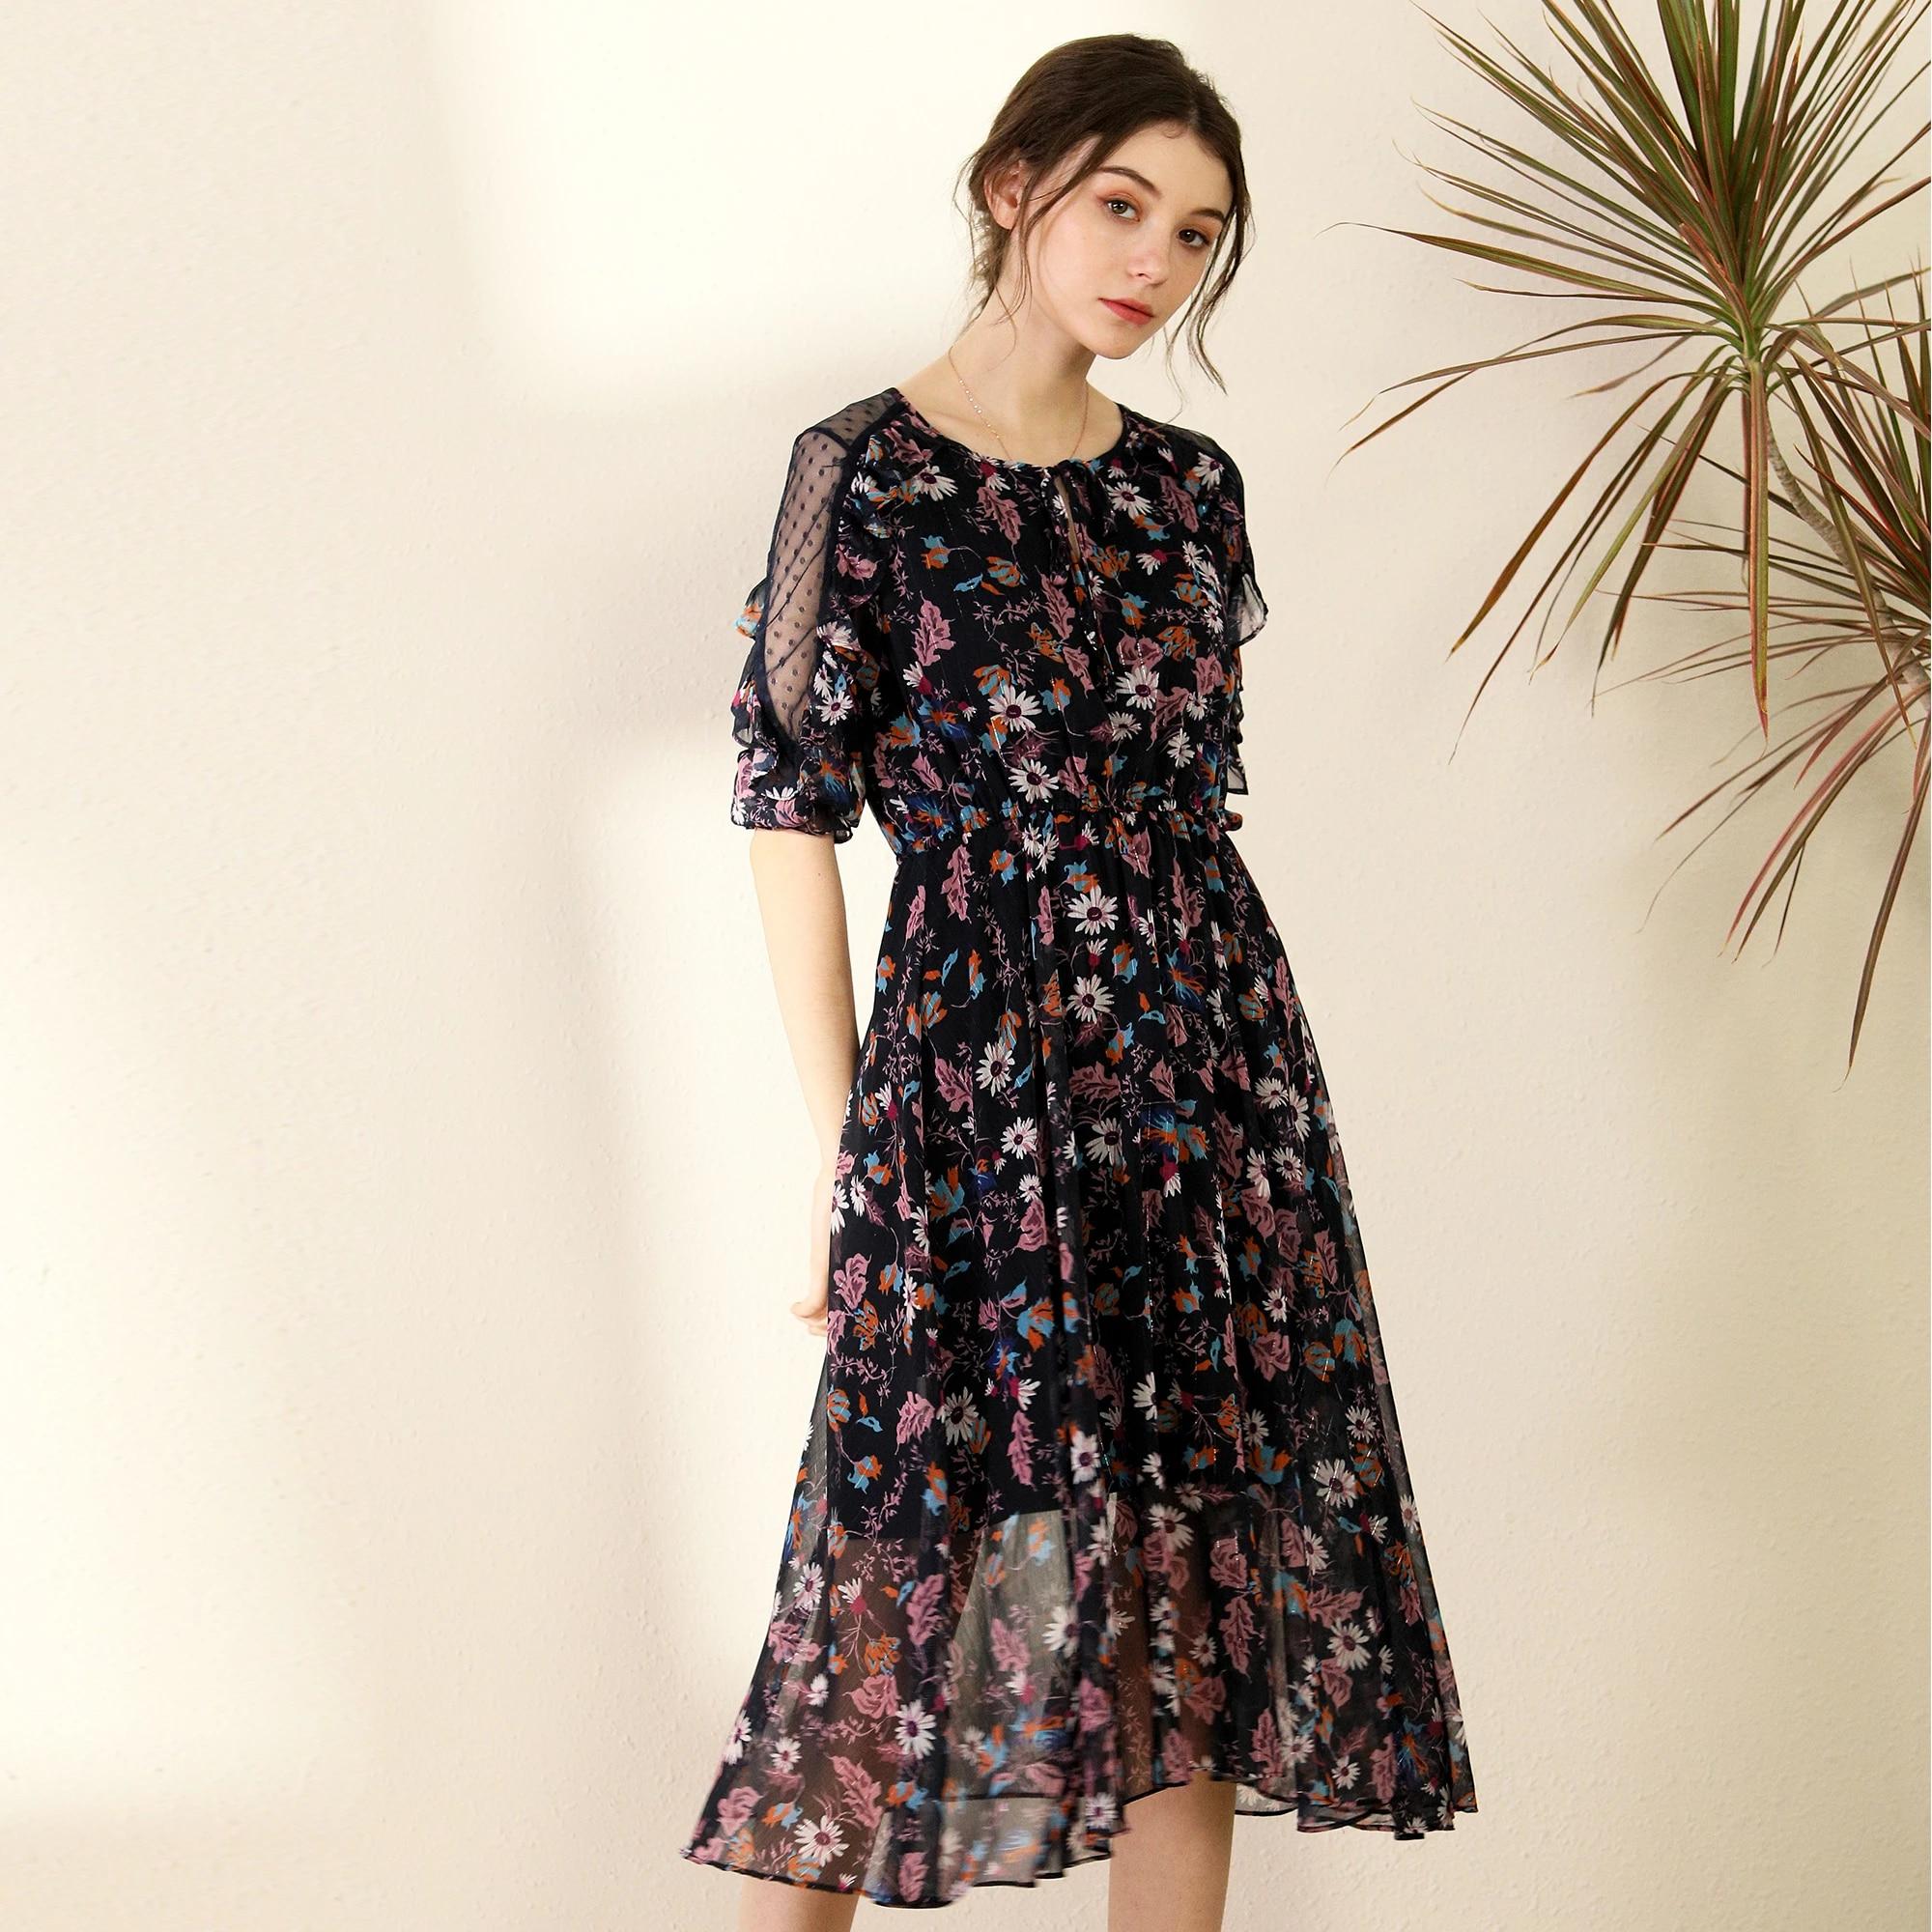 shein dresses for women